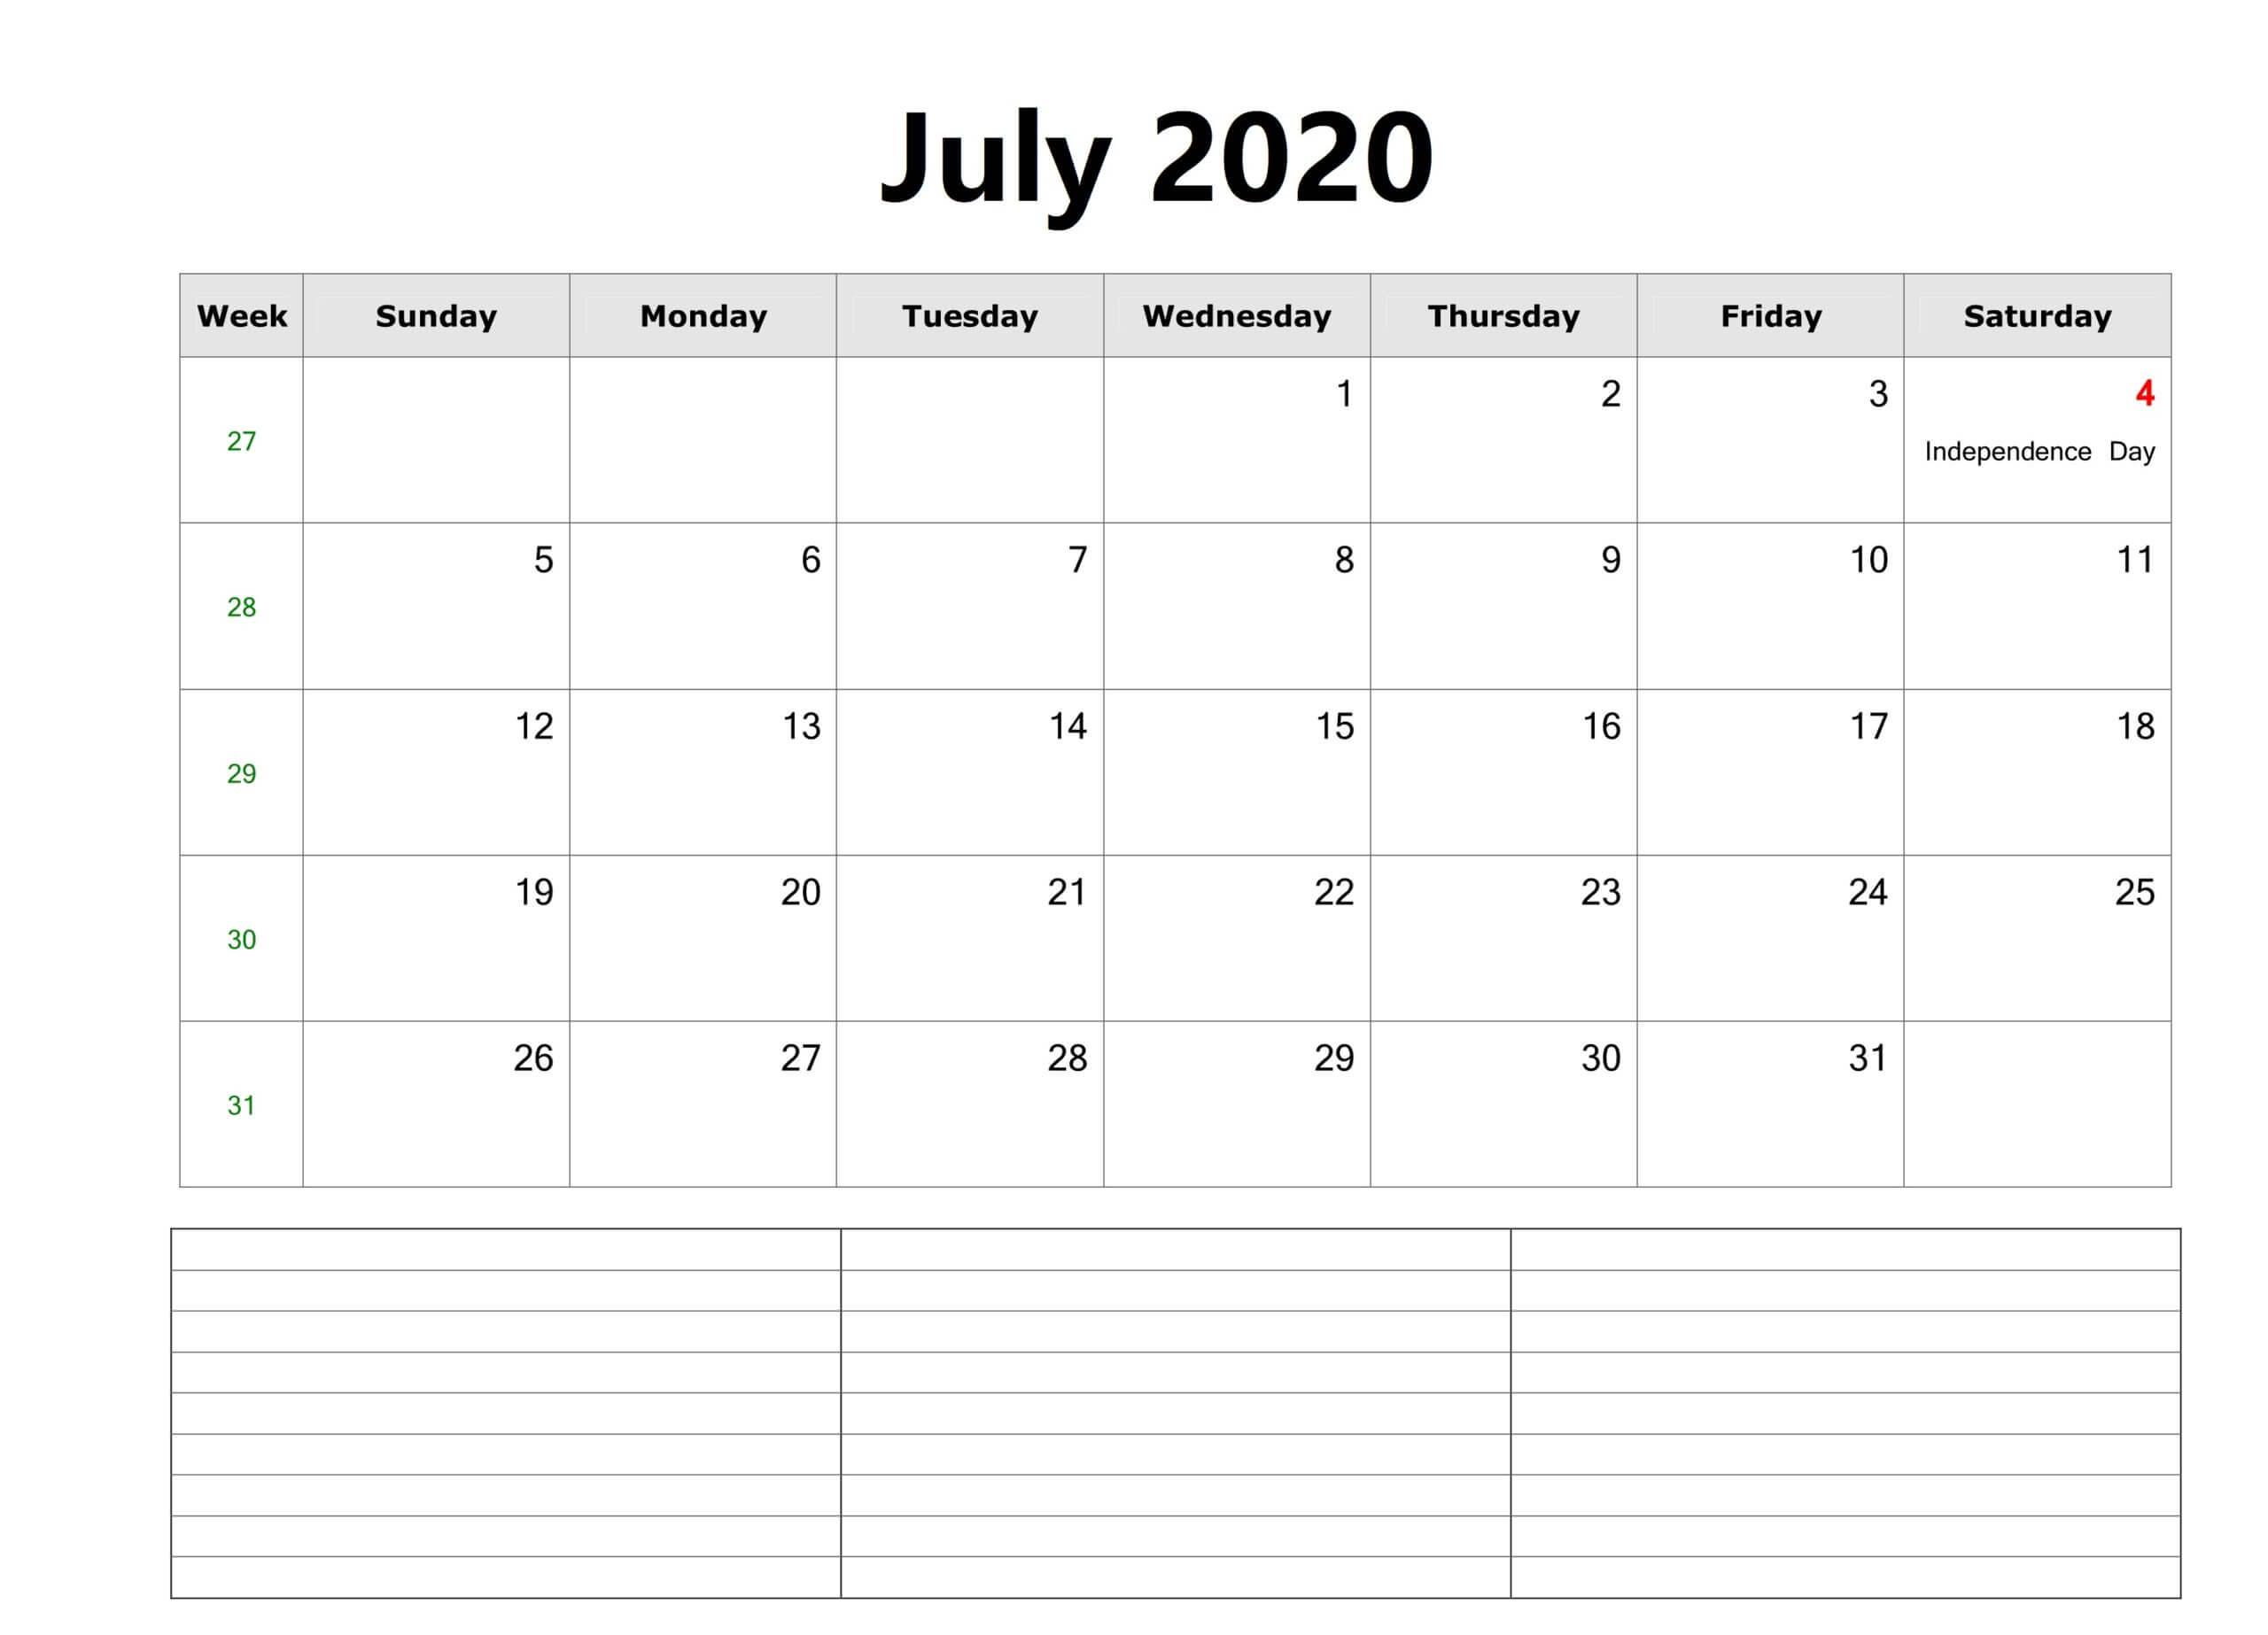 July Calendar 2020 Template free